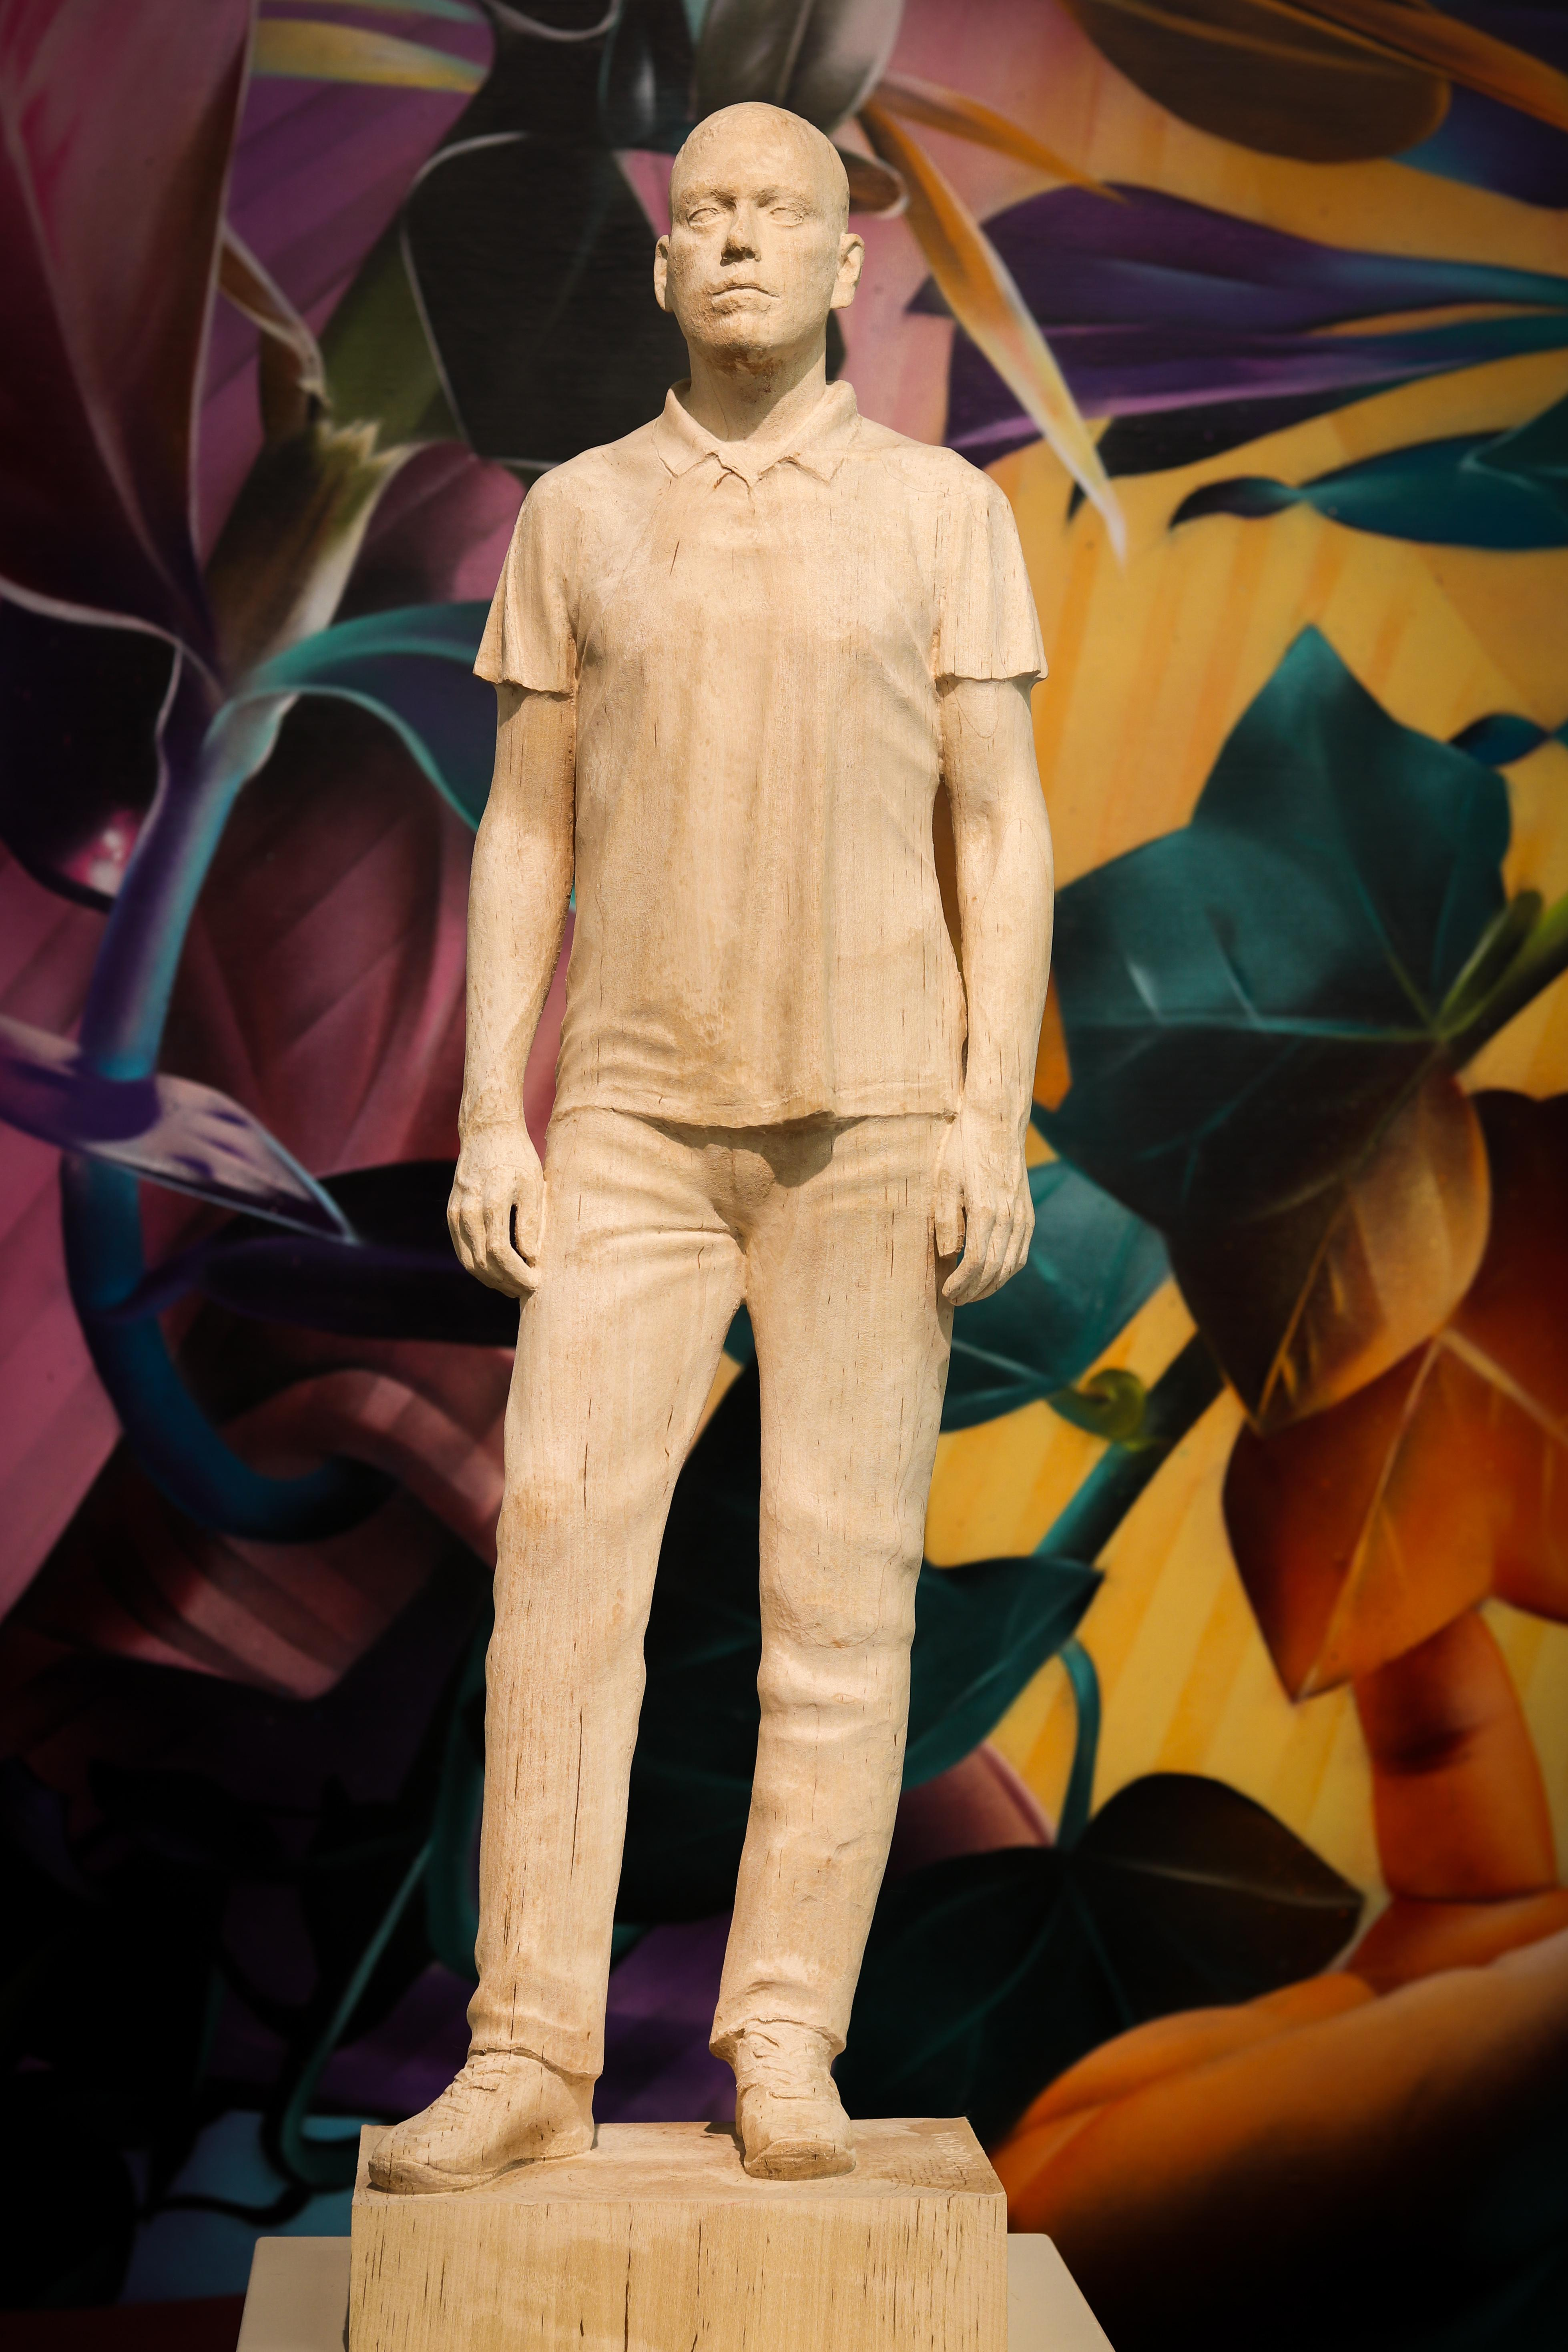 Man Standing, 21st Century Contemporary Wooden Sculpture by Pedro Quesada Sierra